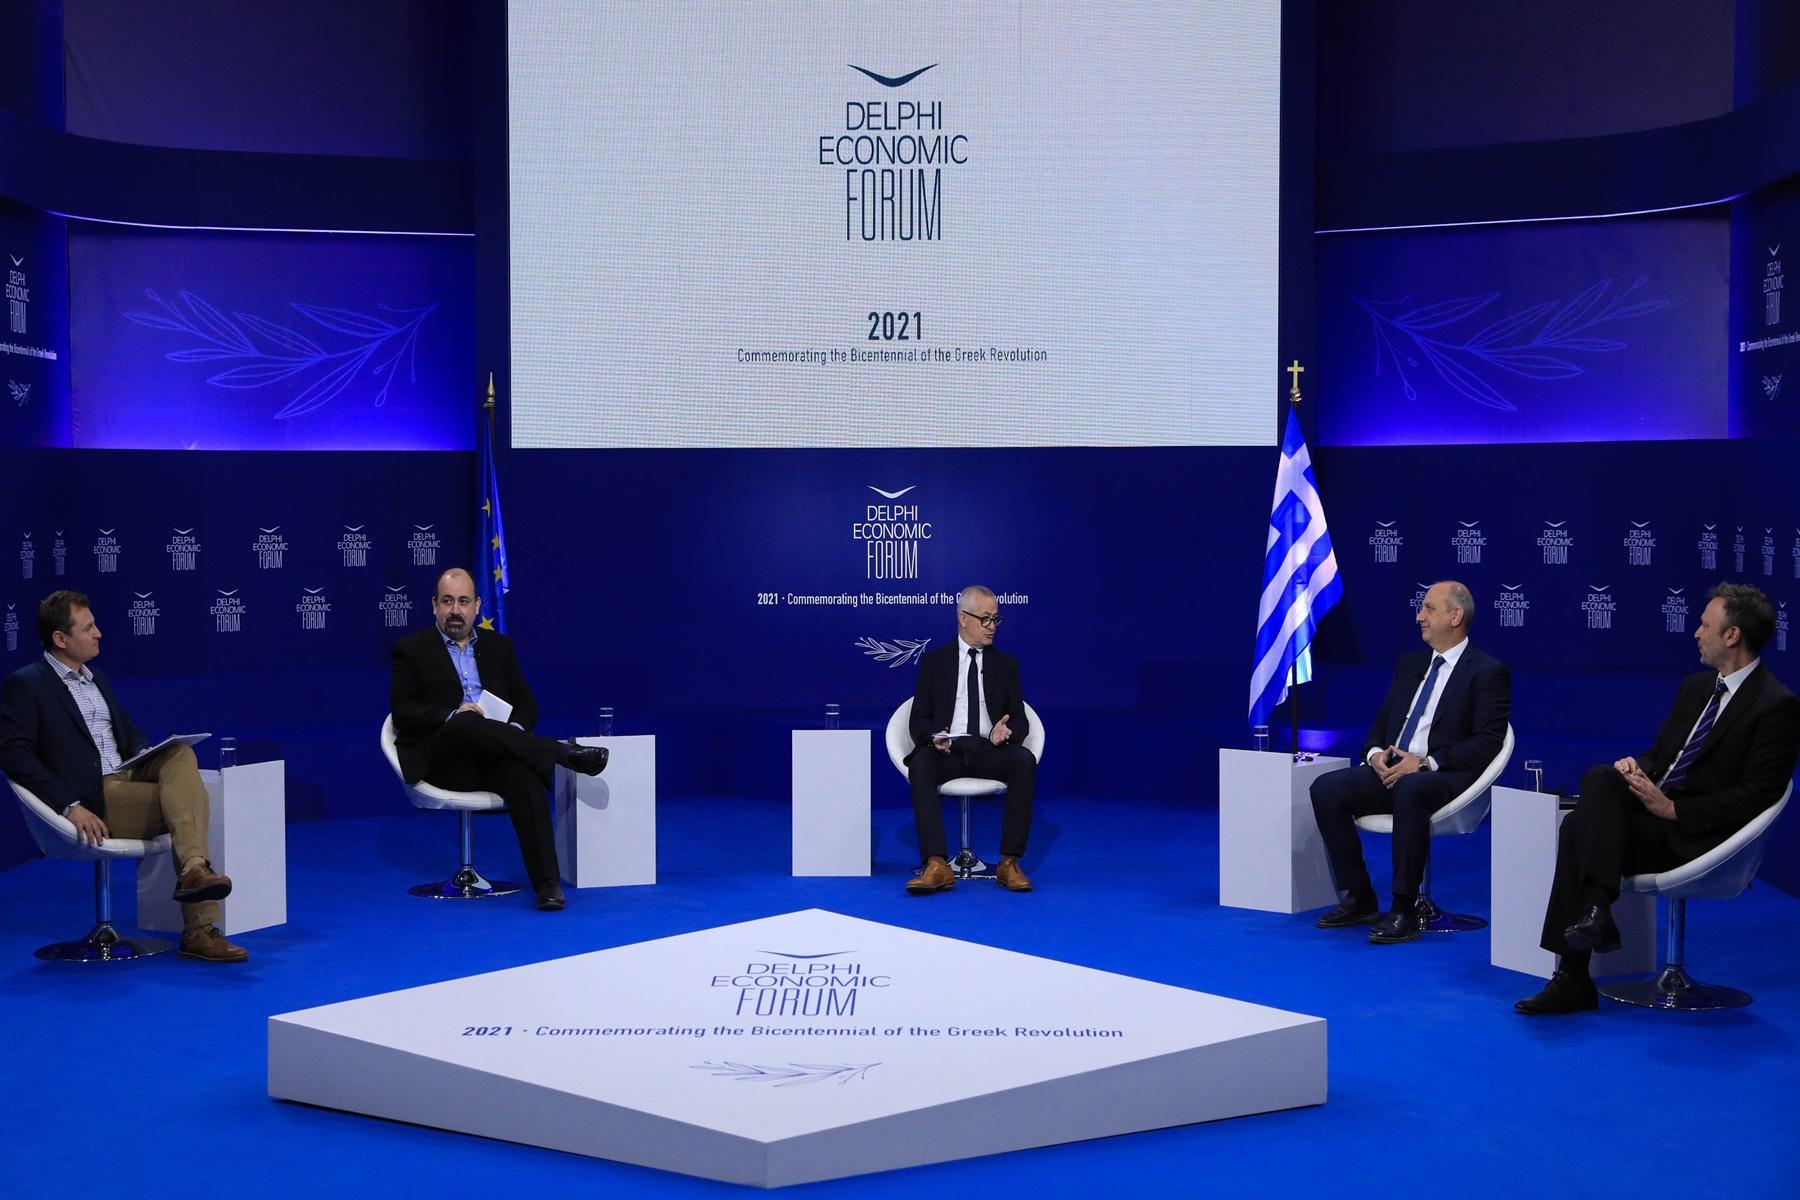 Bayern hellas Delphi economic forum : Το βλέμμα μας είναι στραμμένο στο μέλλον